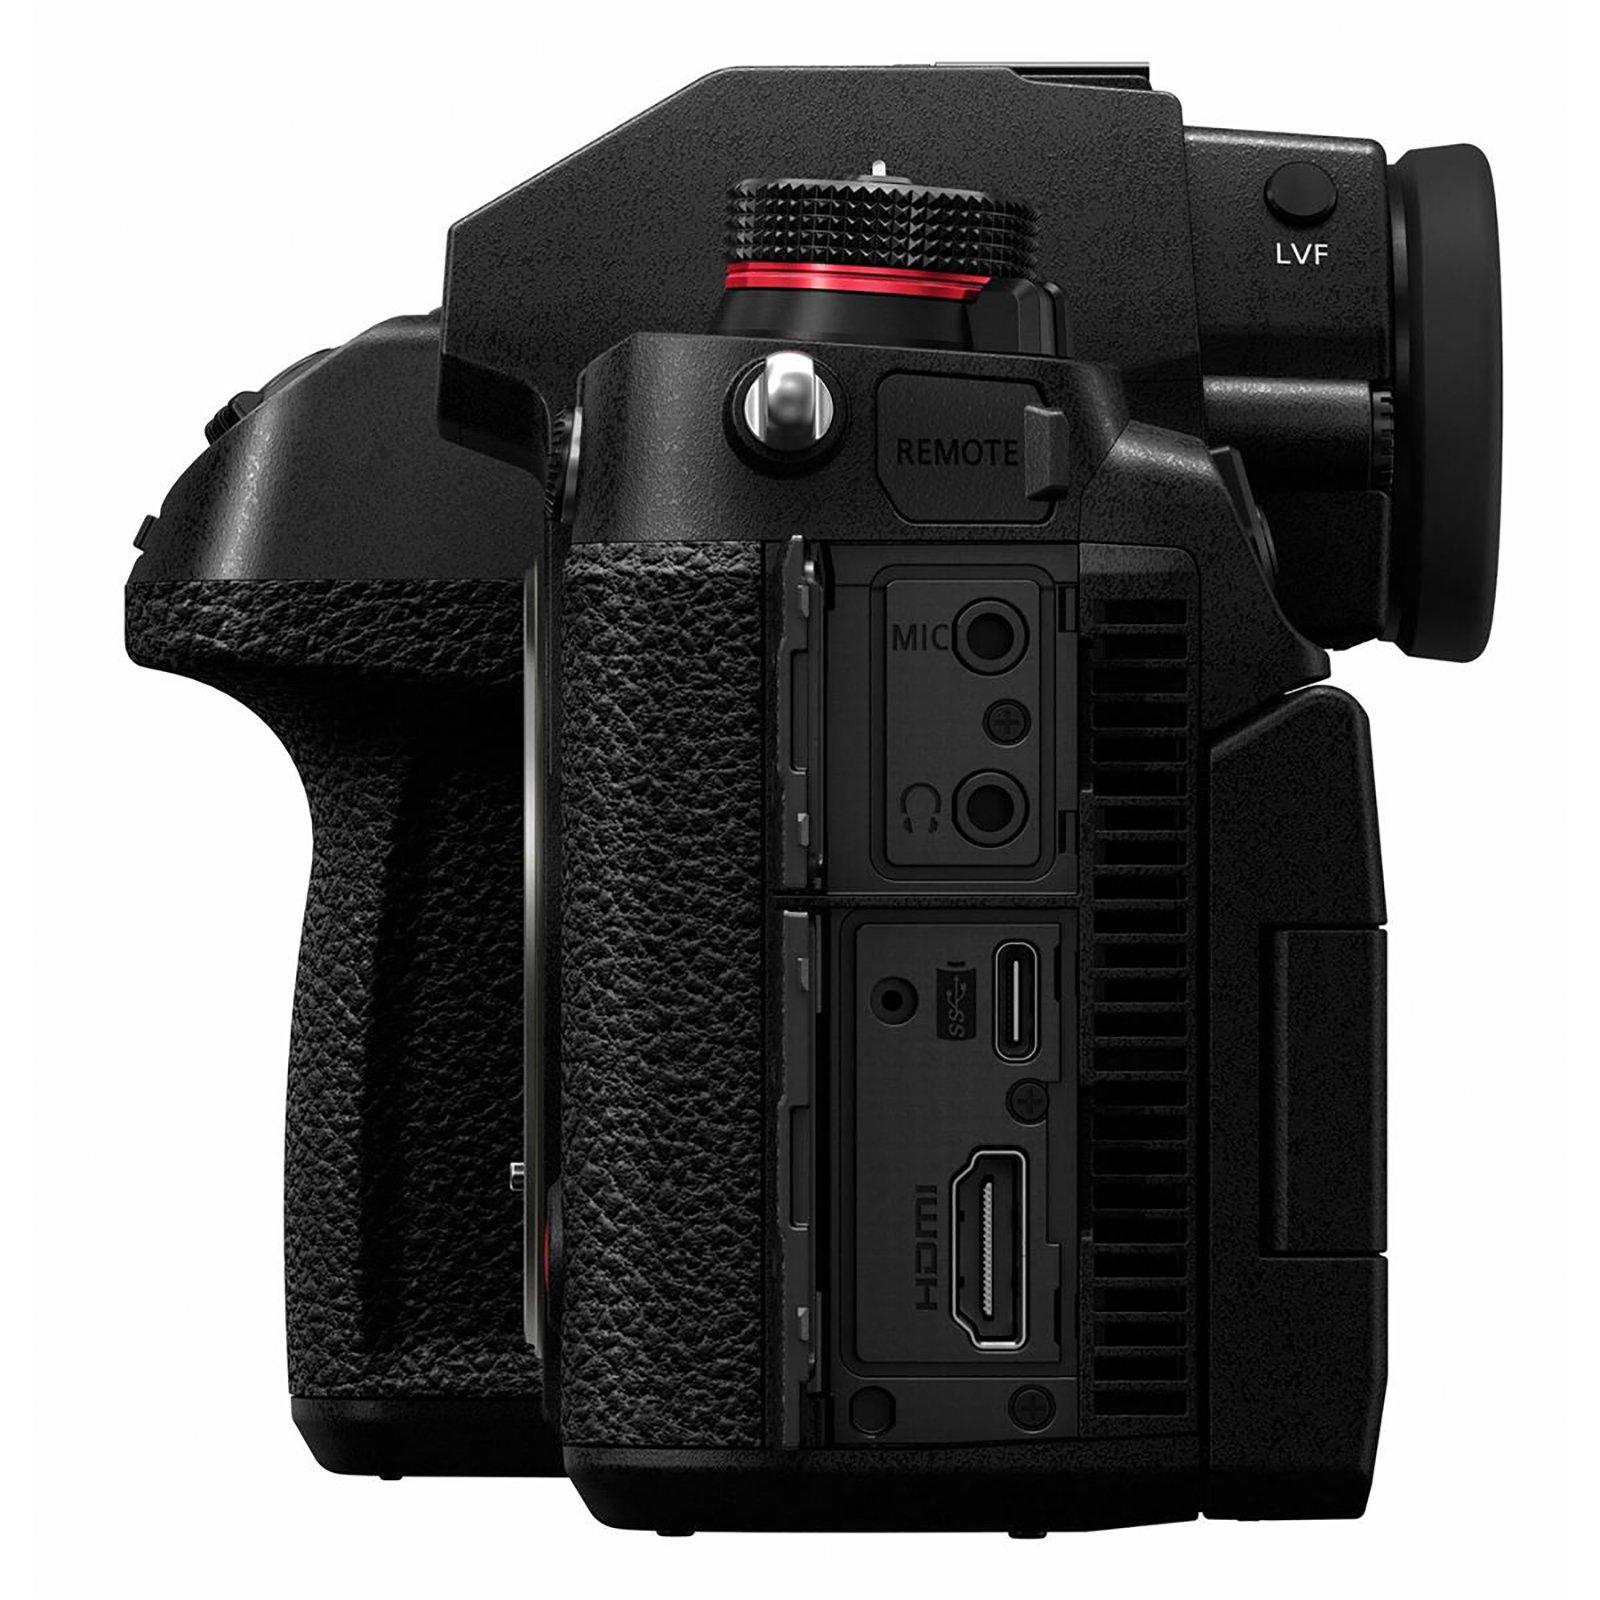 Panasonic Lumix S1H camera detailed